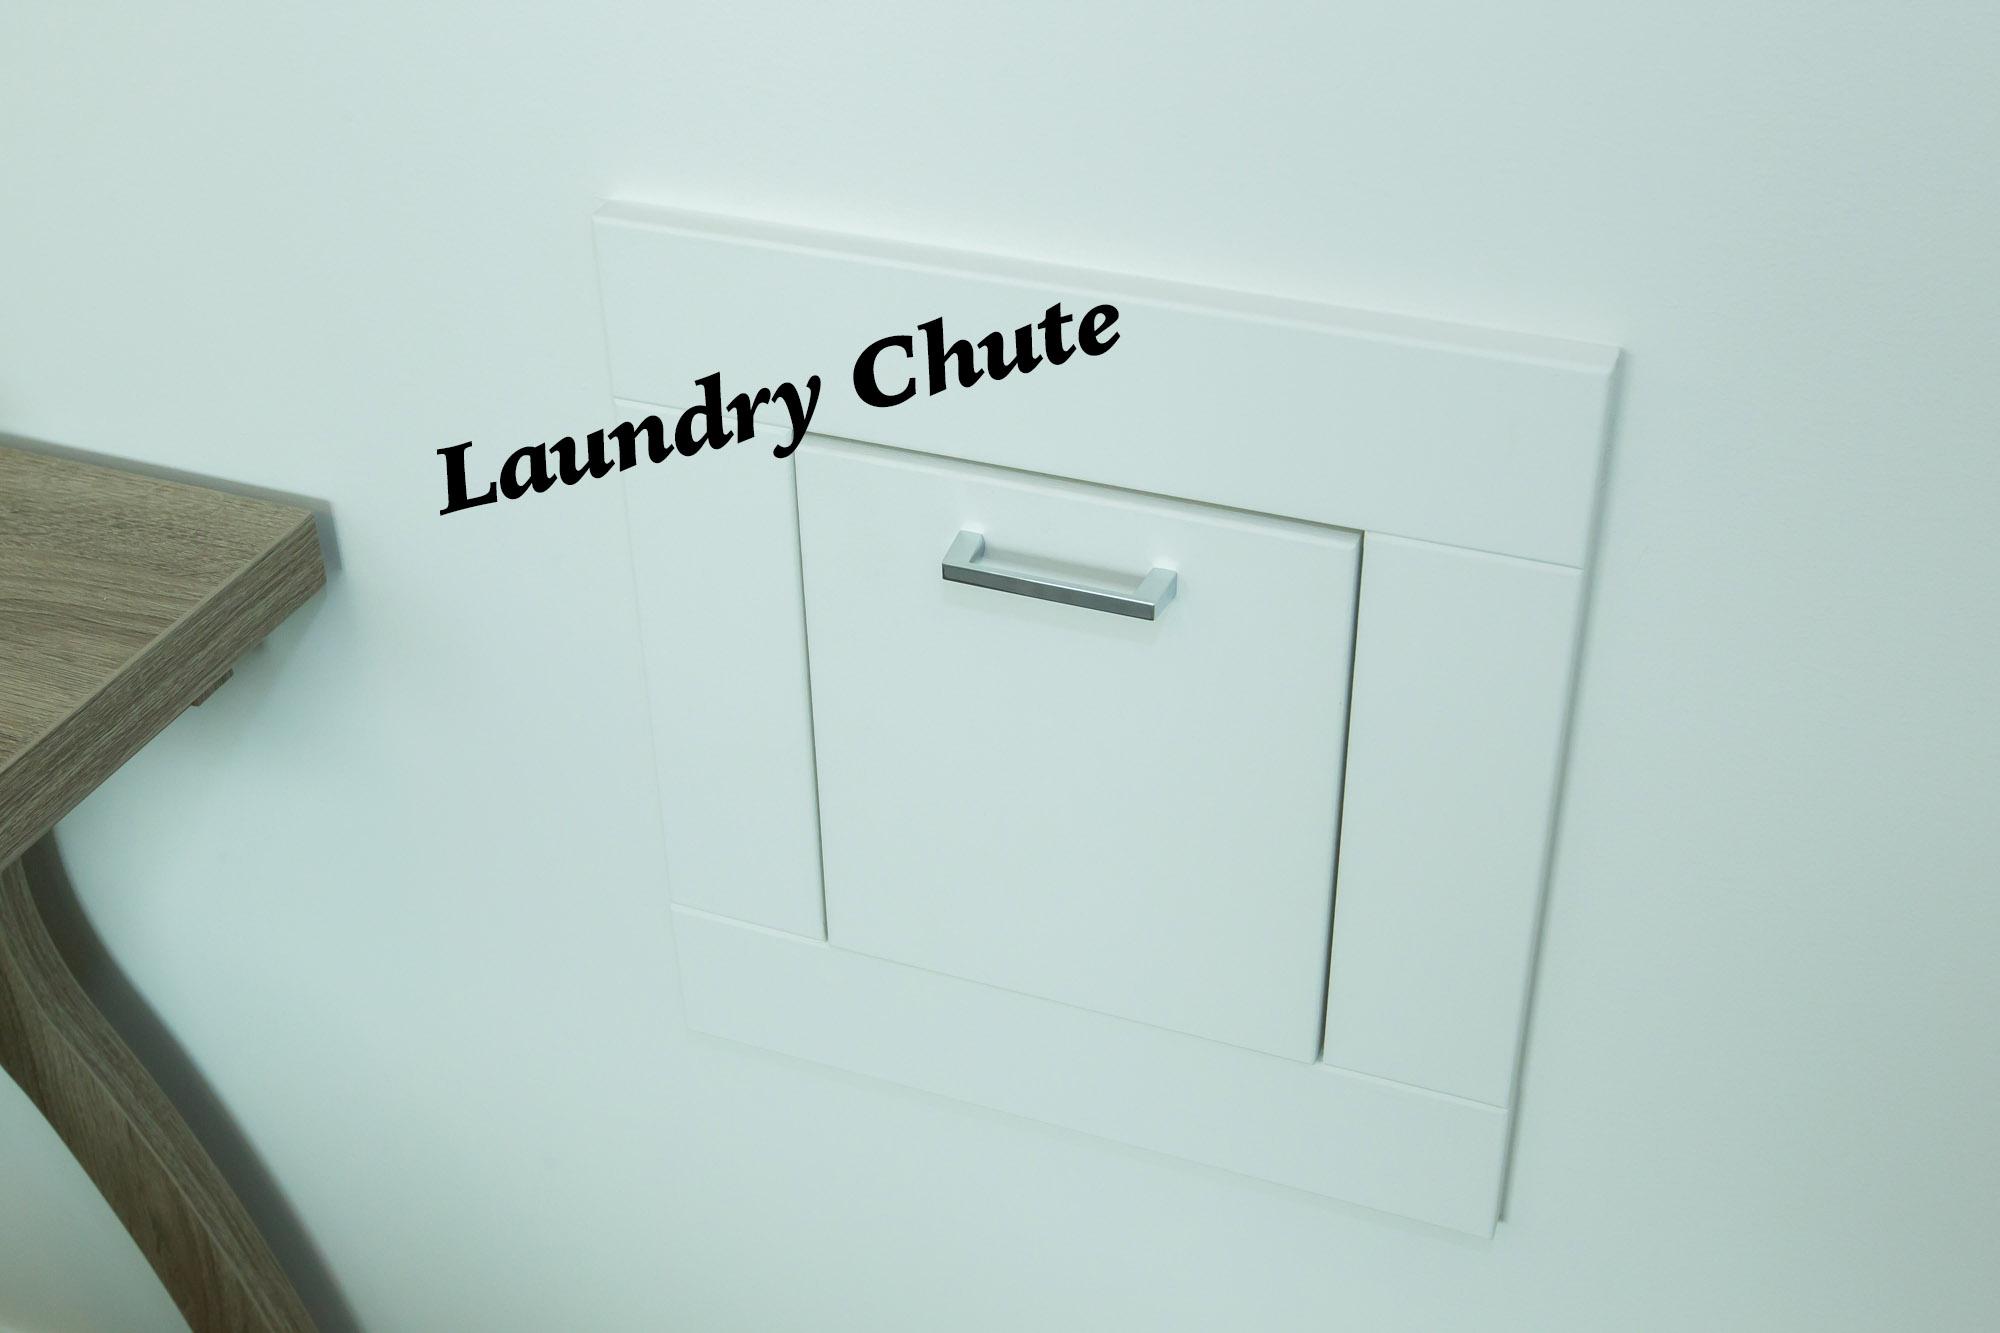 Custom Laundry Chute in Energy Efficient Lethbridge Home